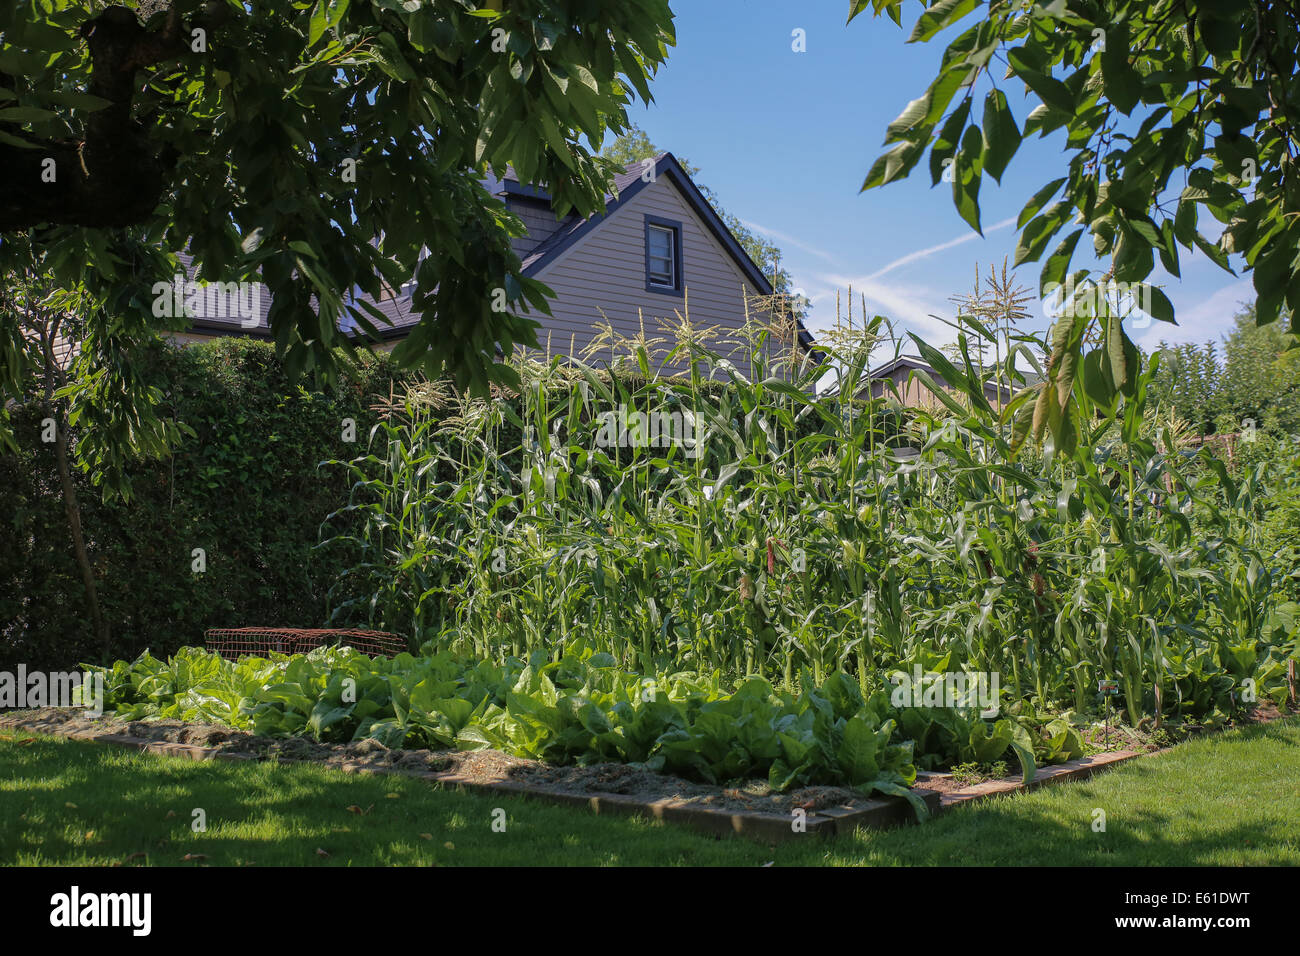 growing corn backyard vegetable garden stock photo royalty free